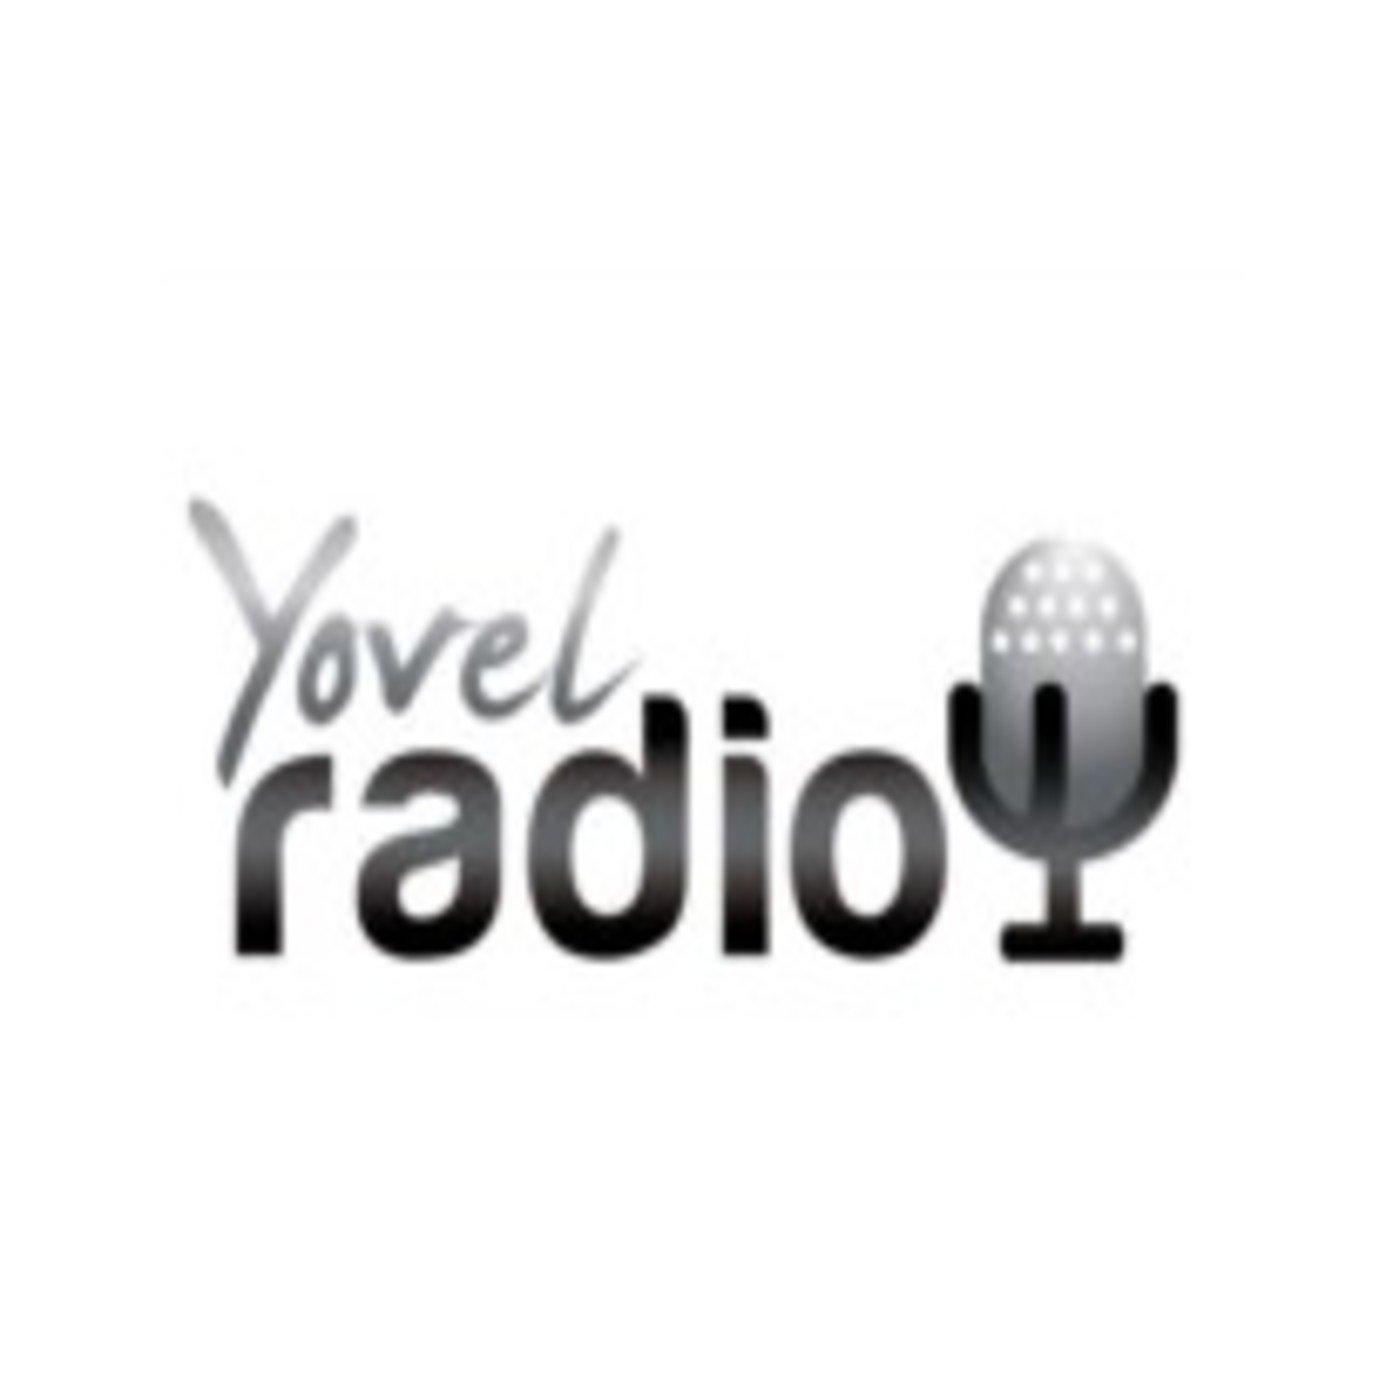 <![CDATA[Yovel Radio]]>